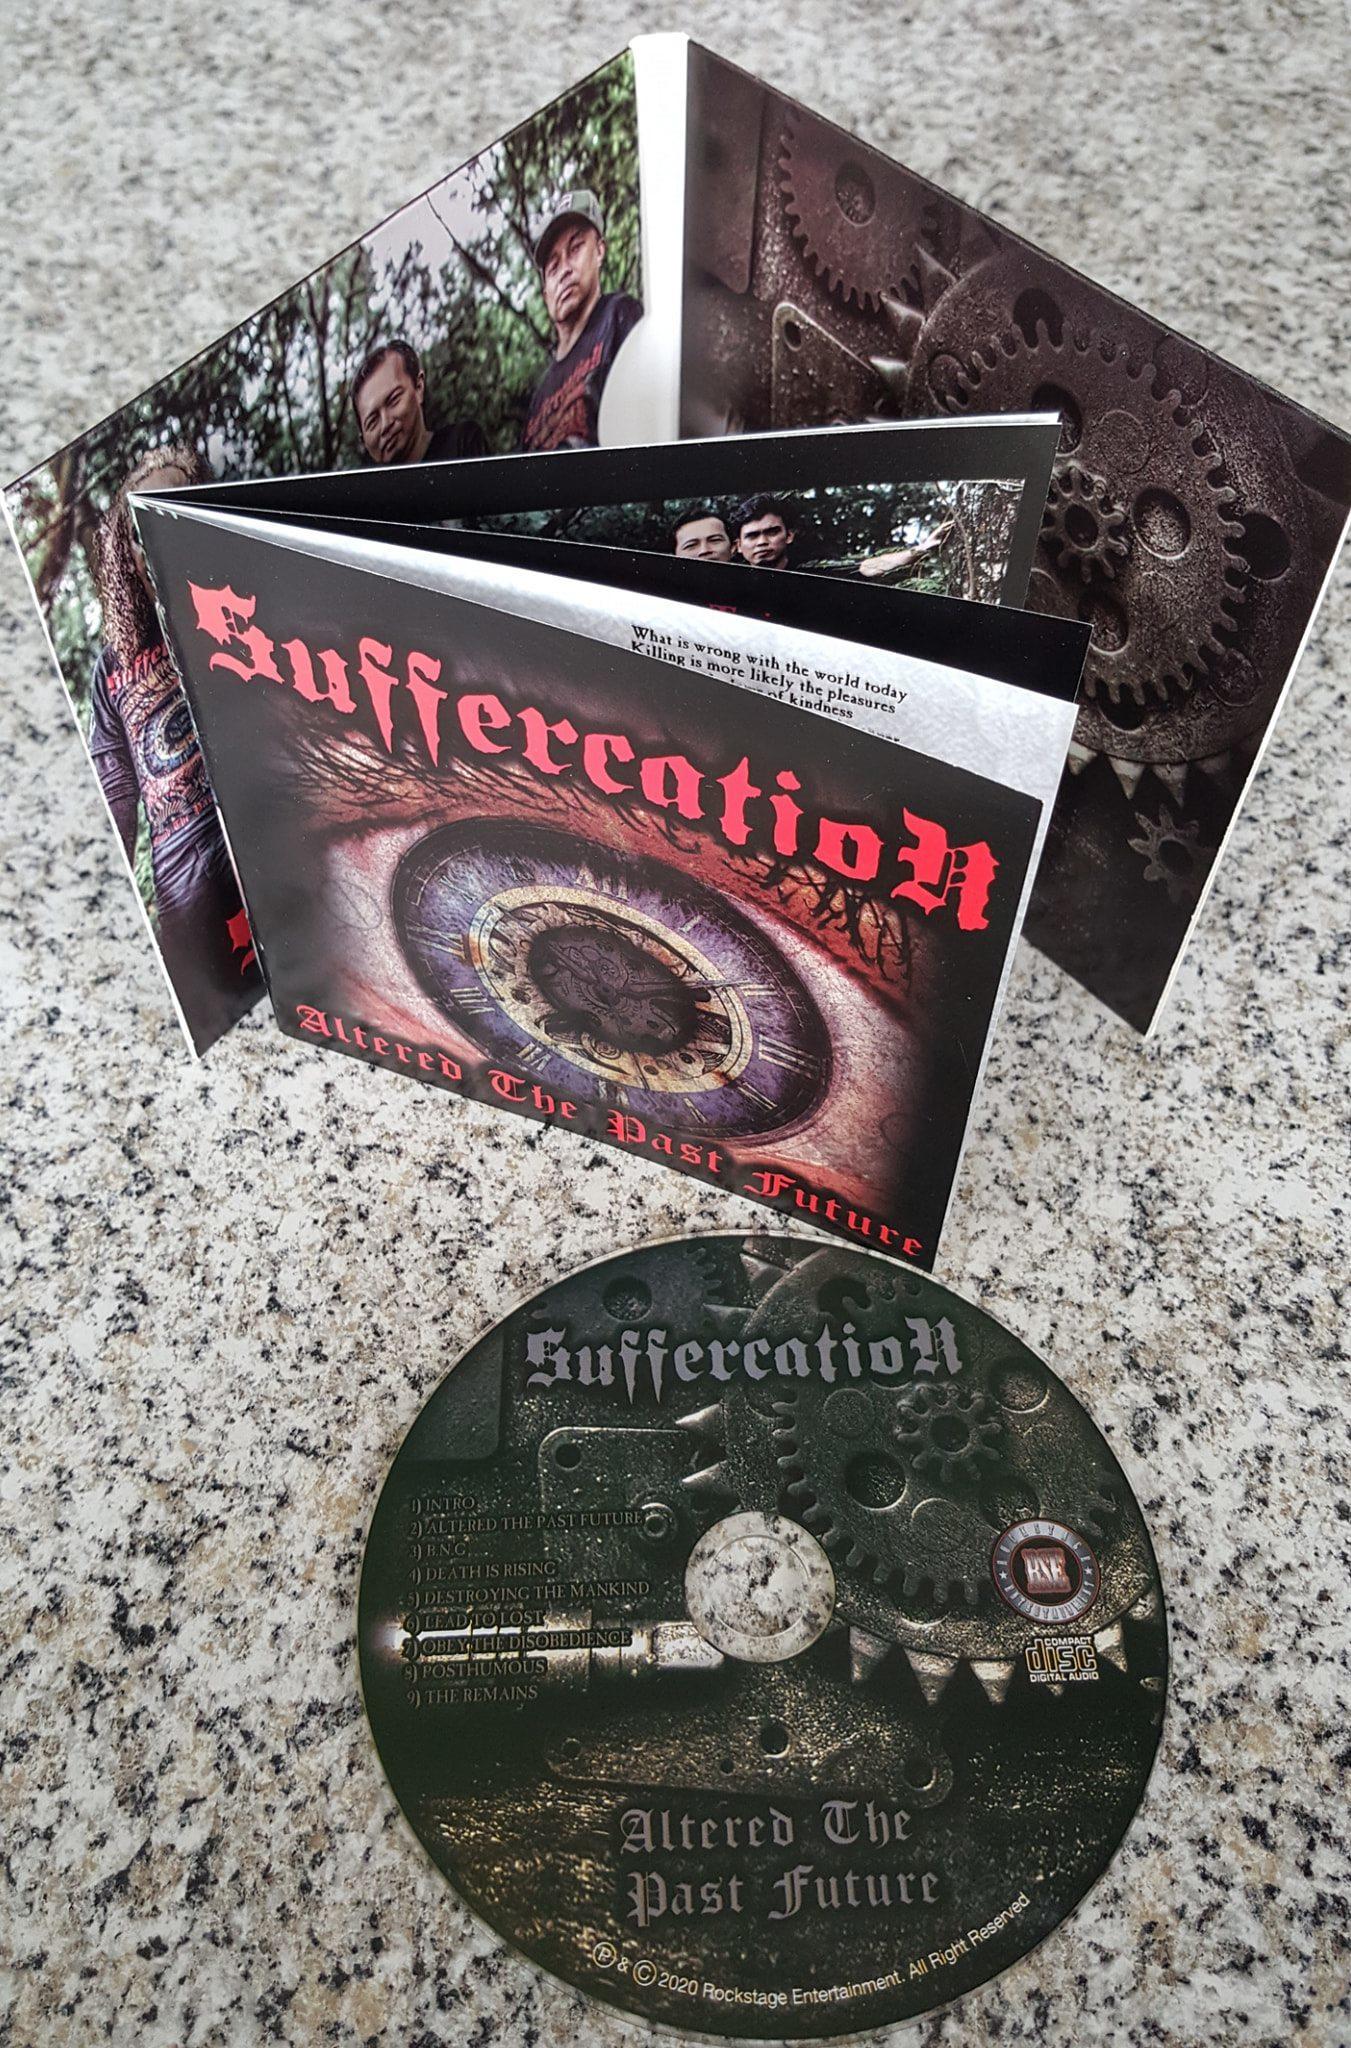 SUFFERCATION Altered the Past Future (digipak) CD2.jpg